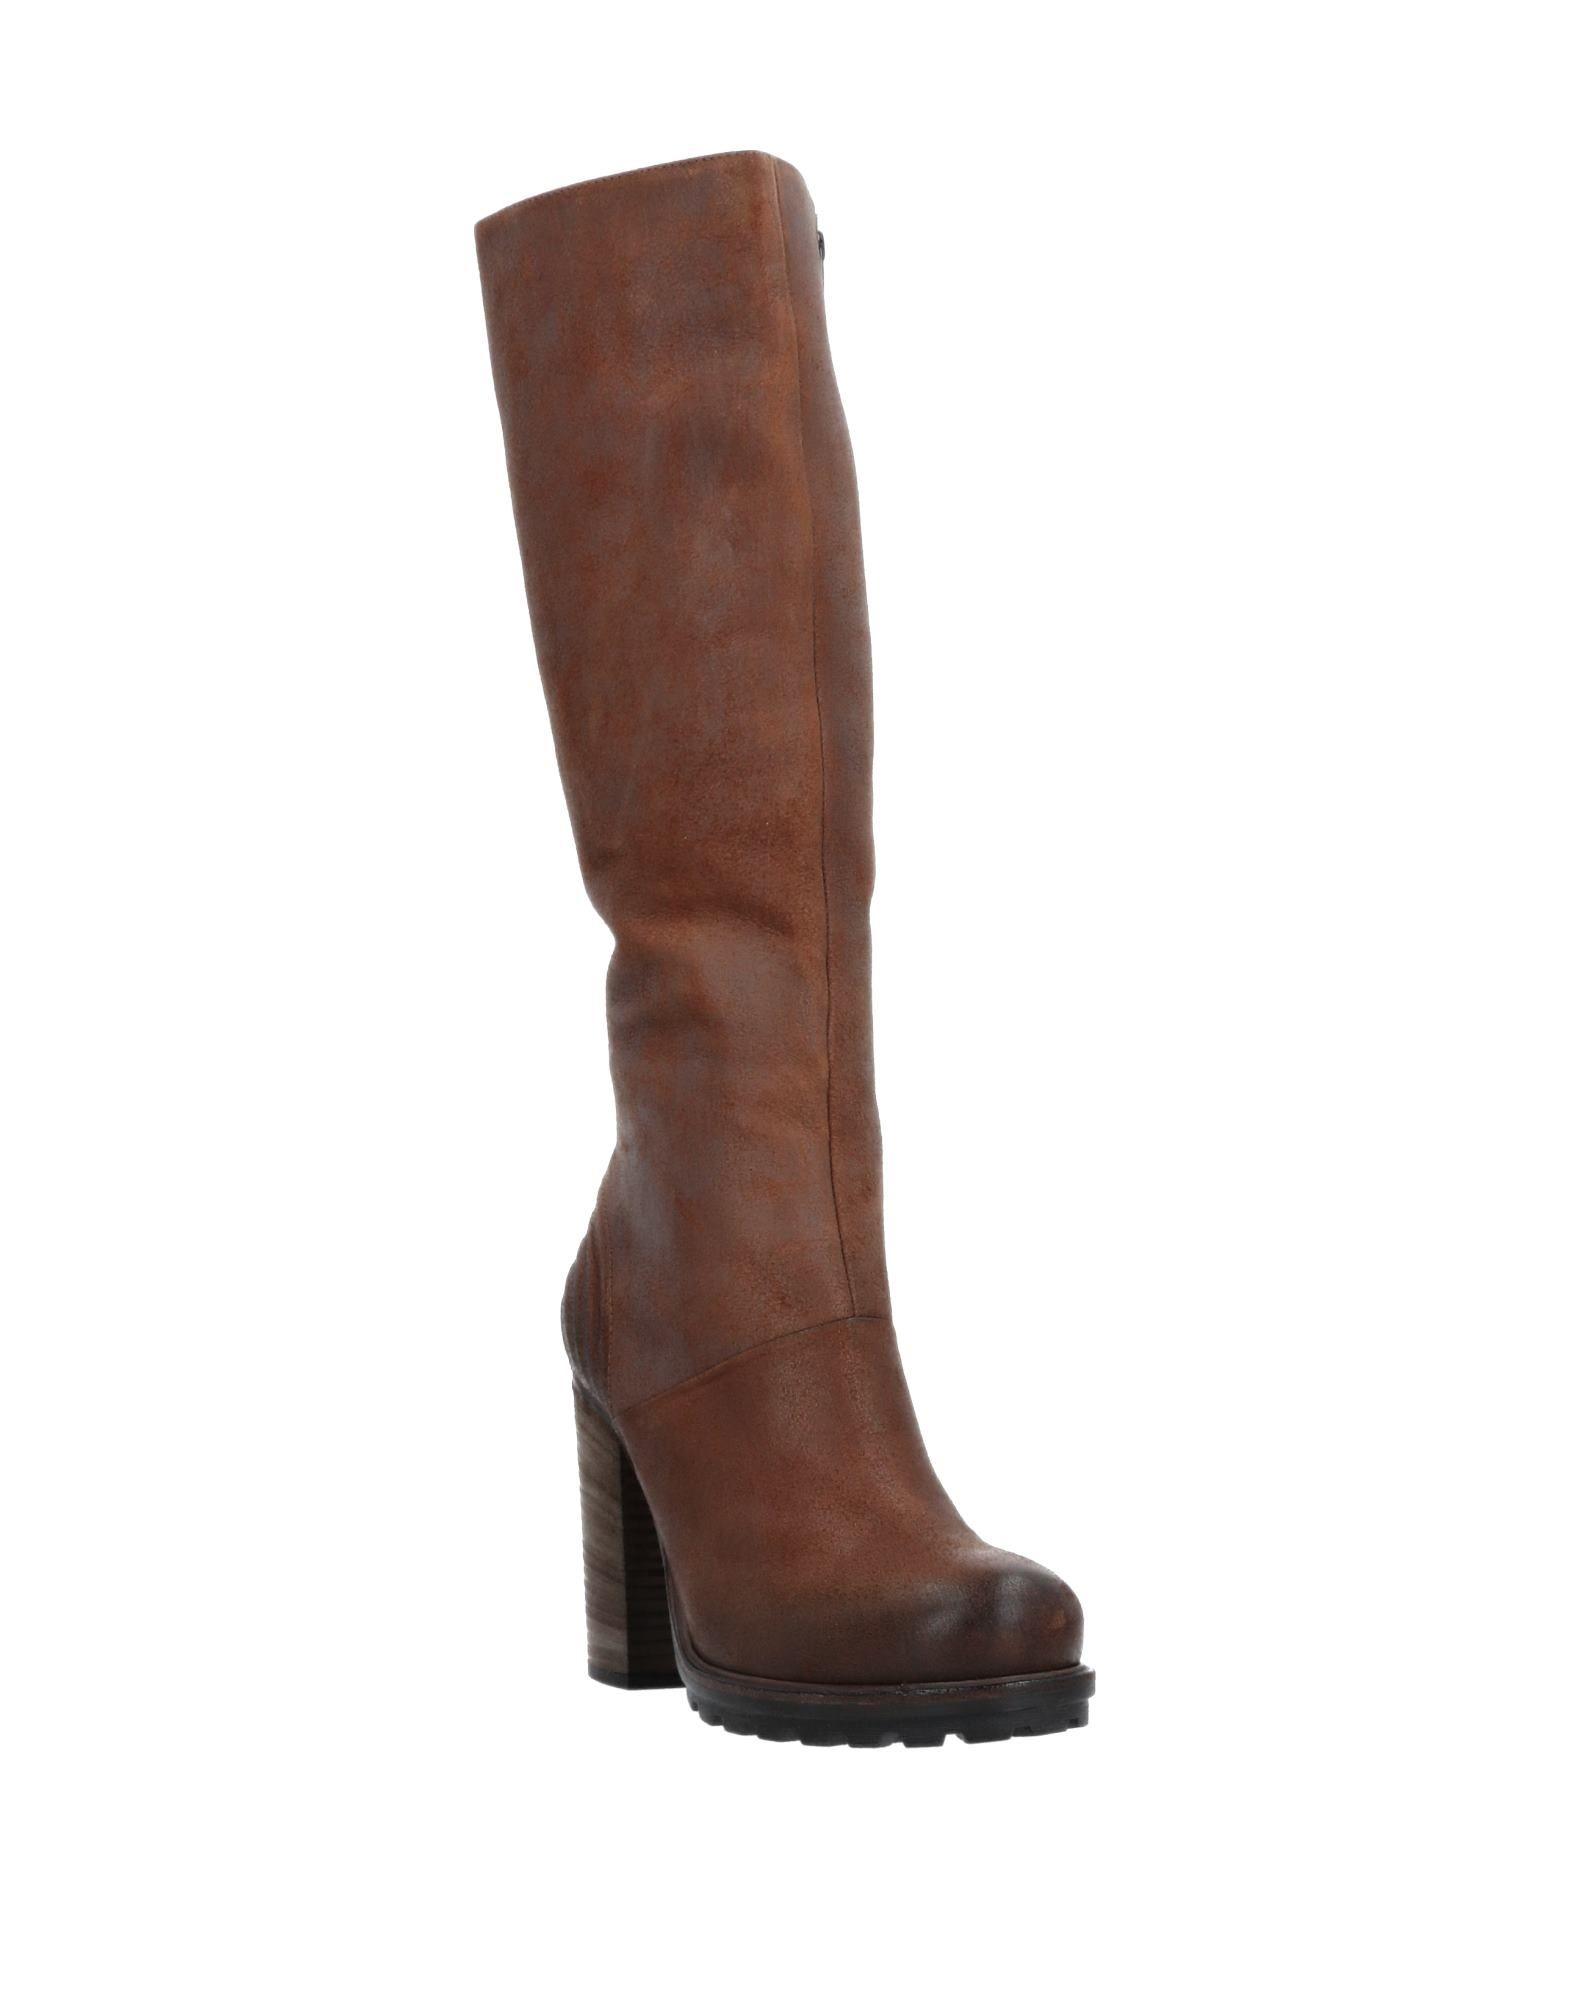 Stilvolle billige  Schuhe Vic Stiefel Damen  billige 11518941SO a3f585